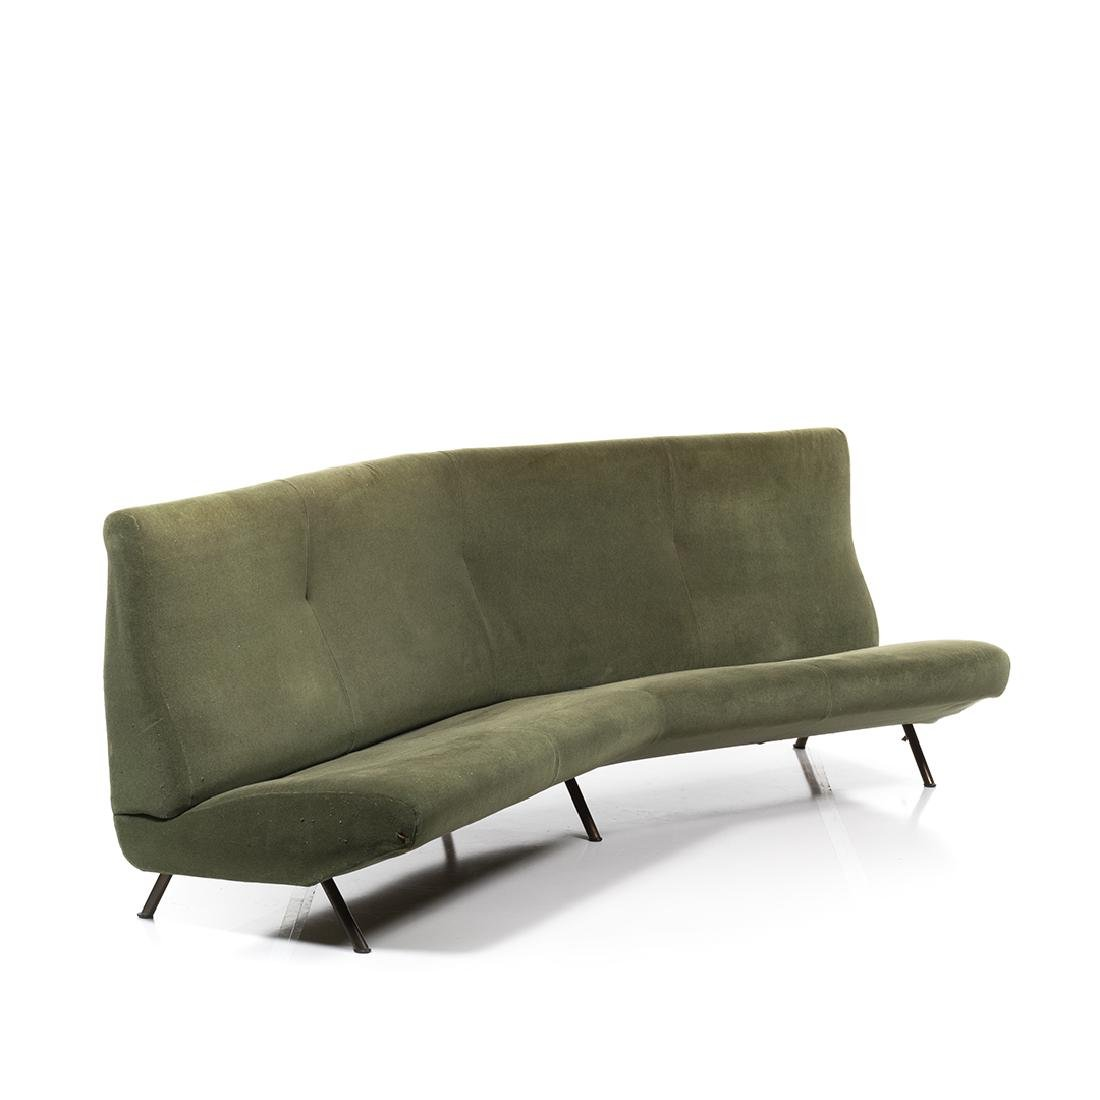 Marco Zanuso Triennale Sofa